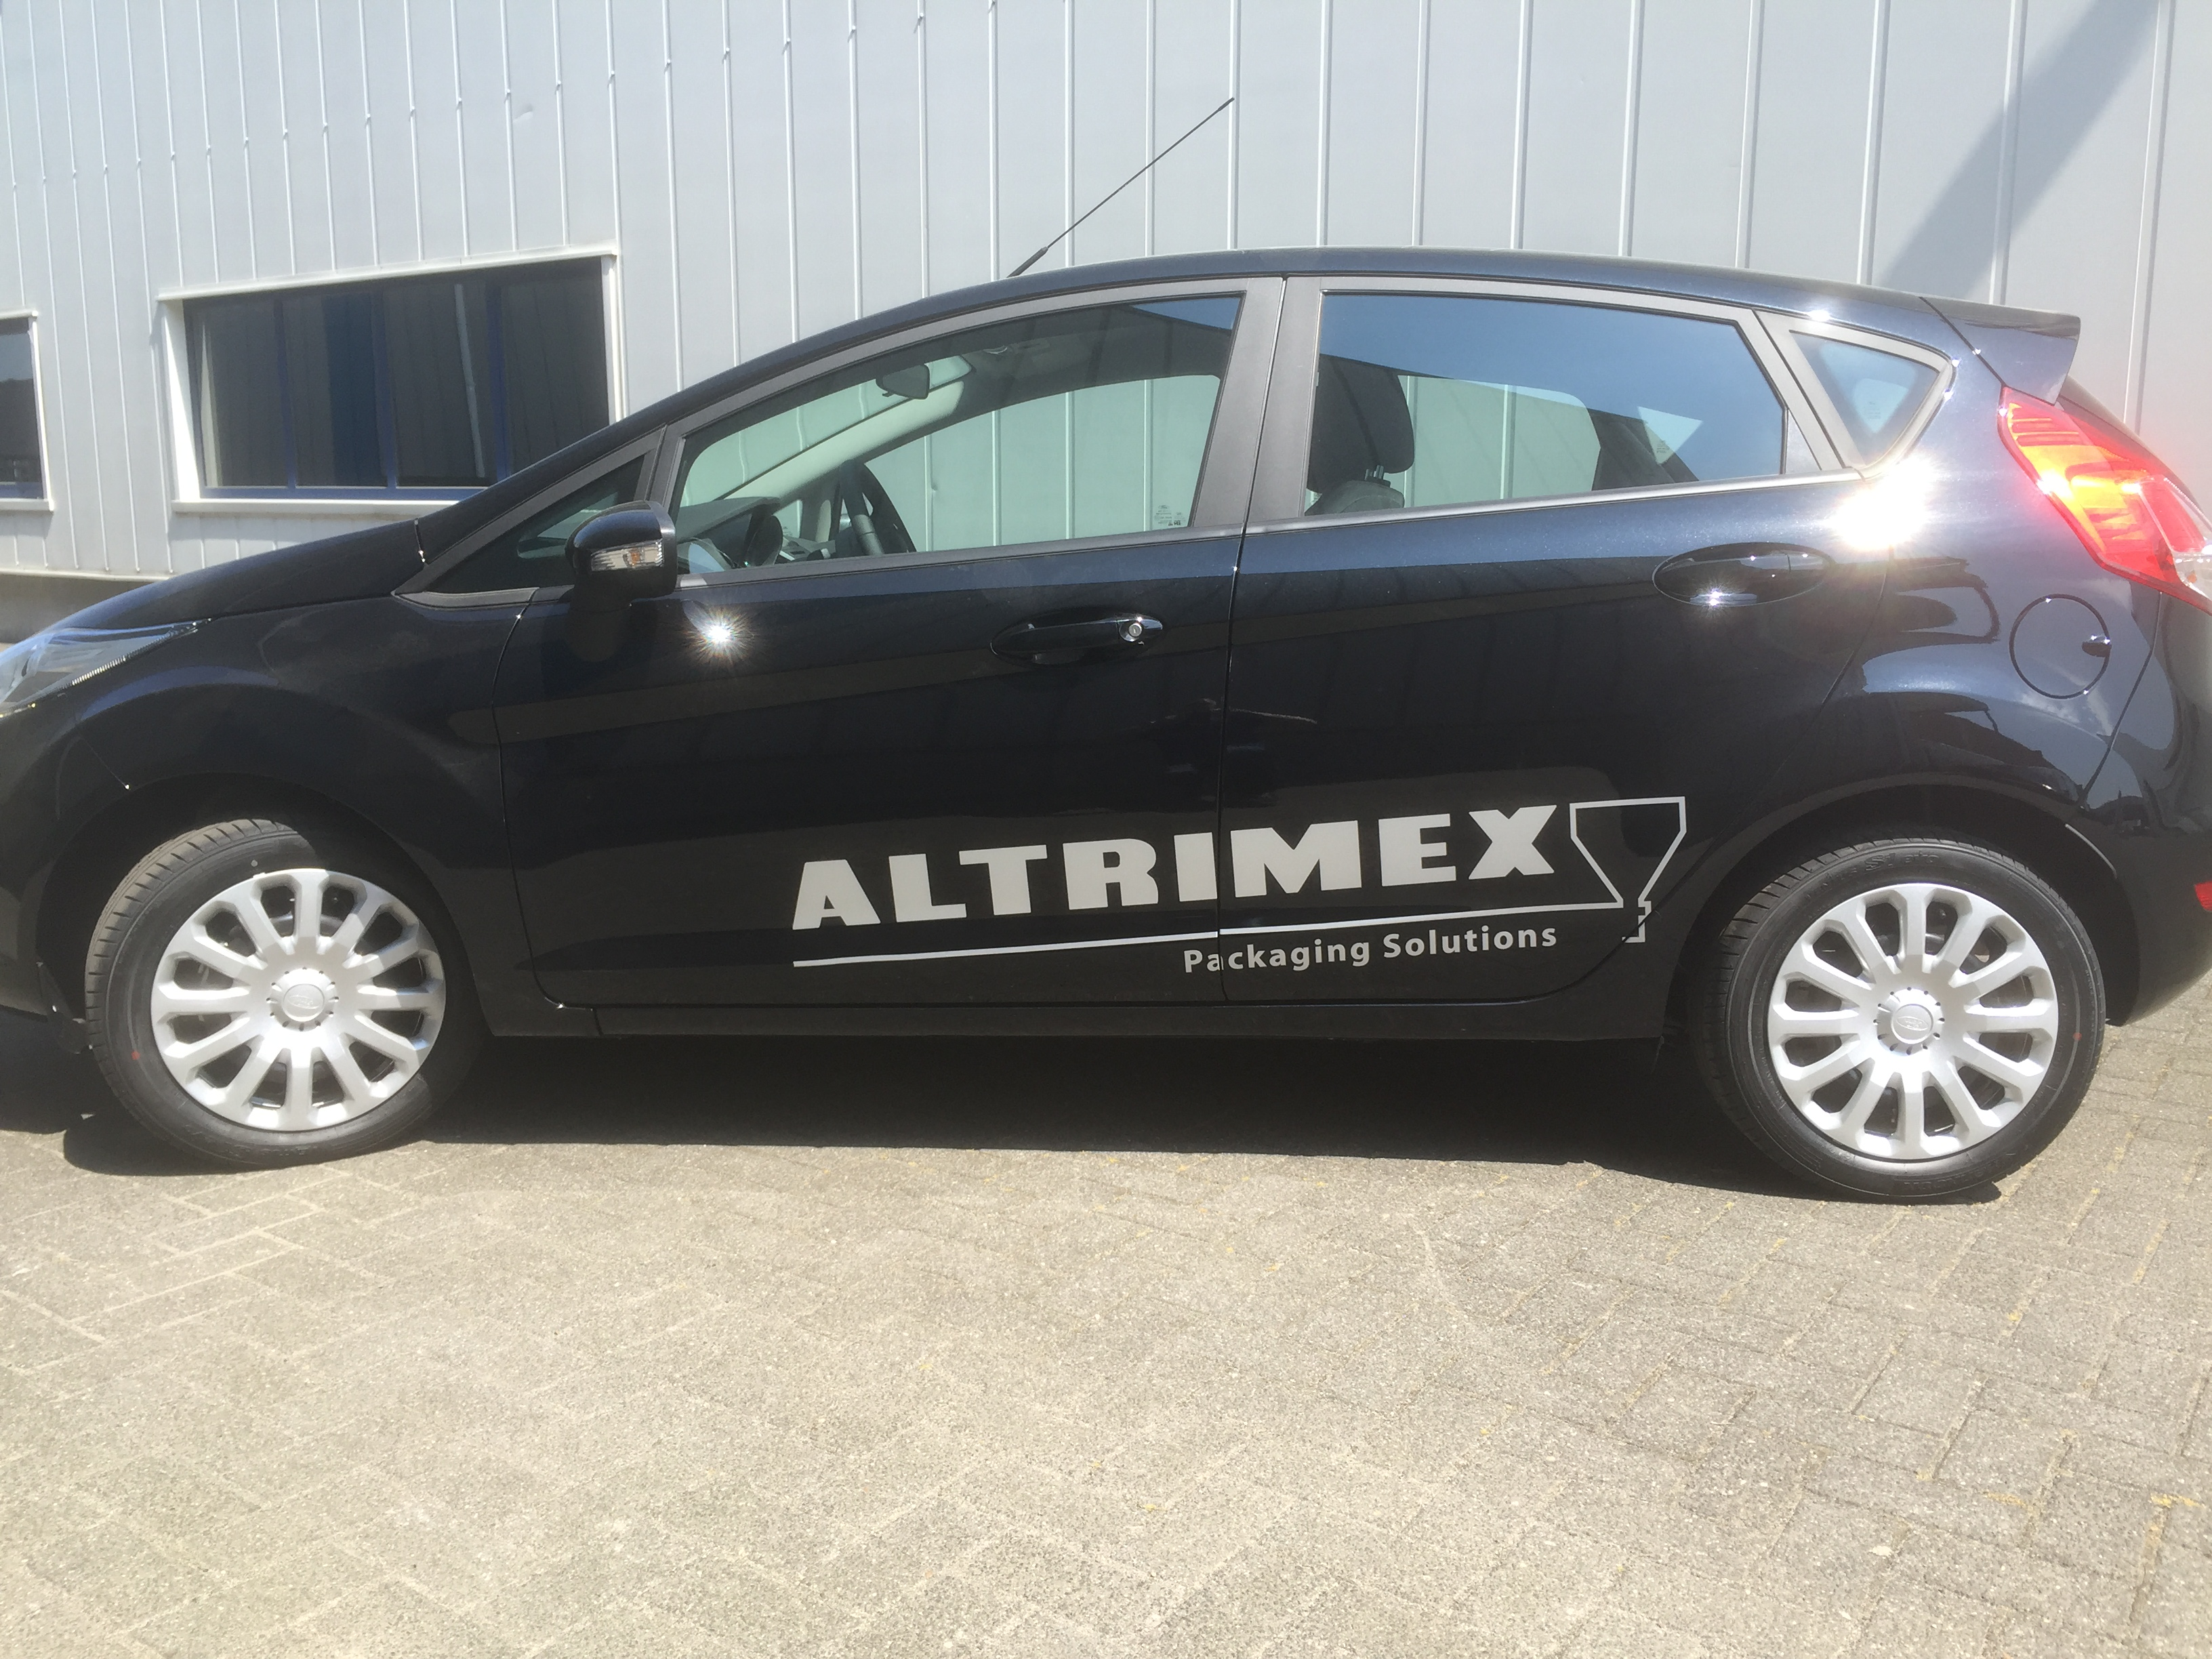 Altrimex